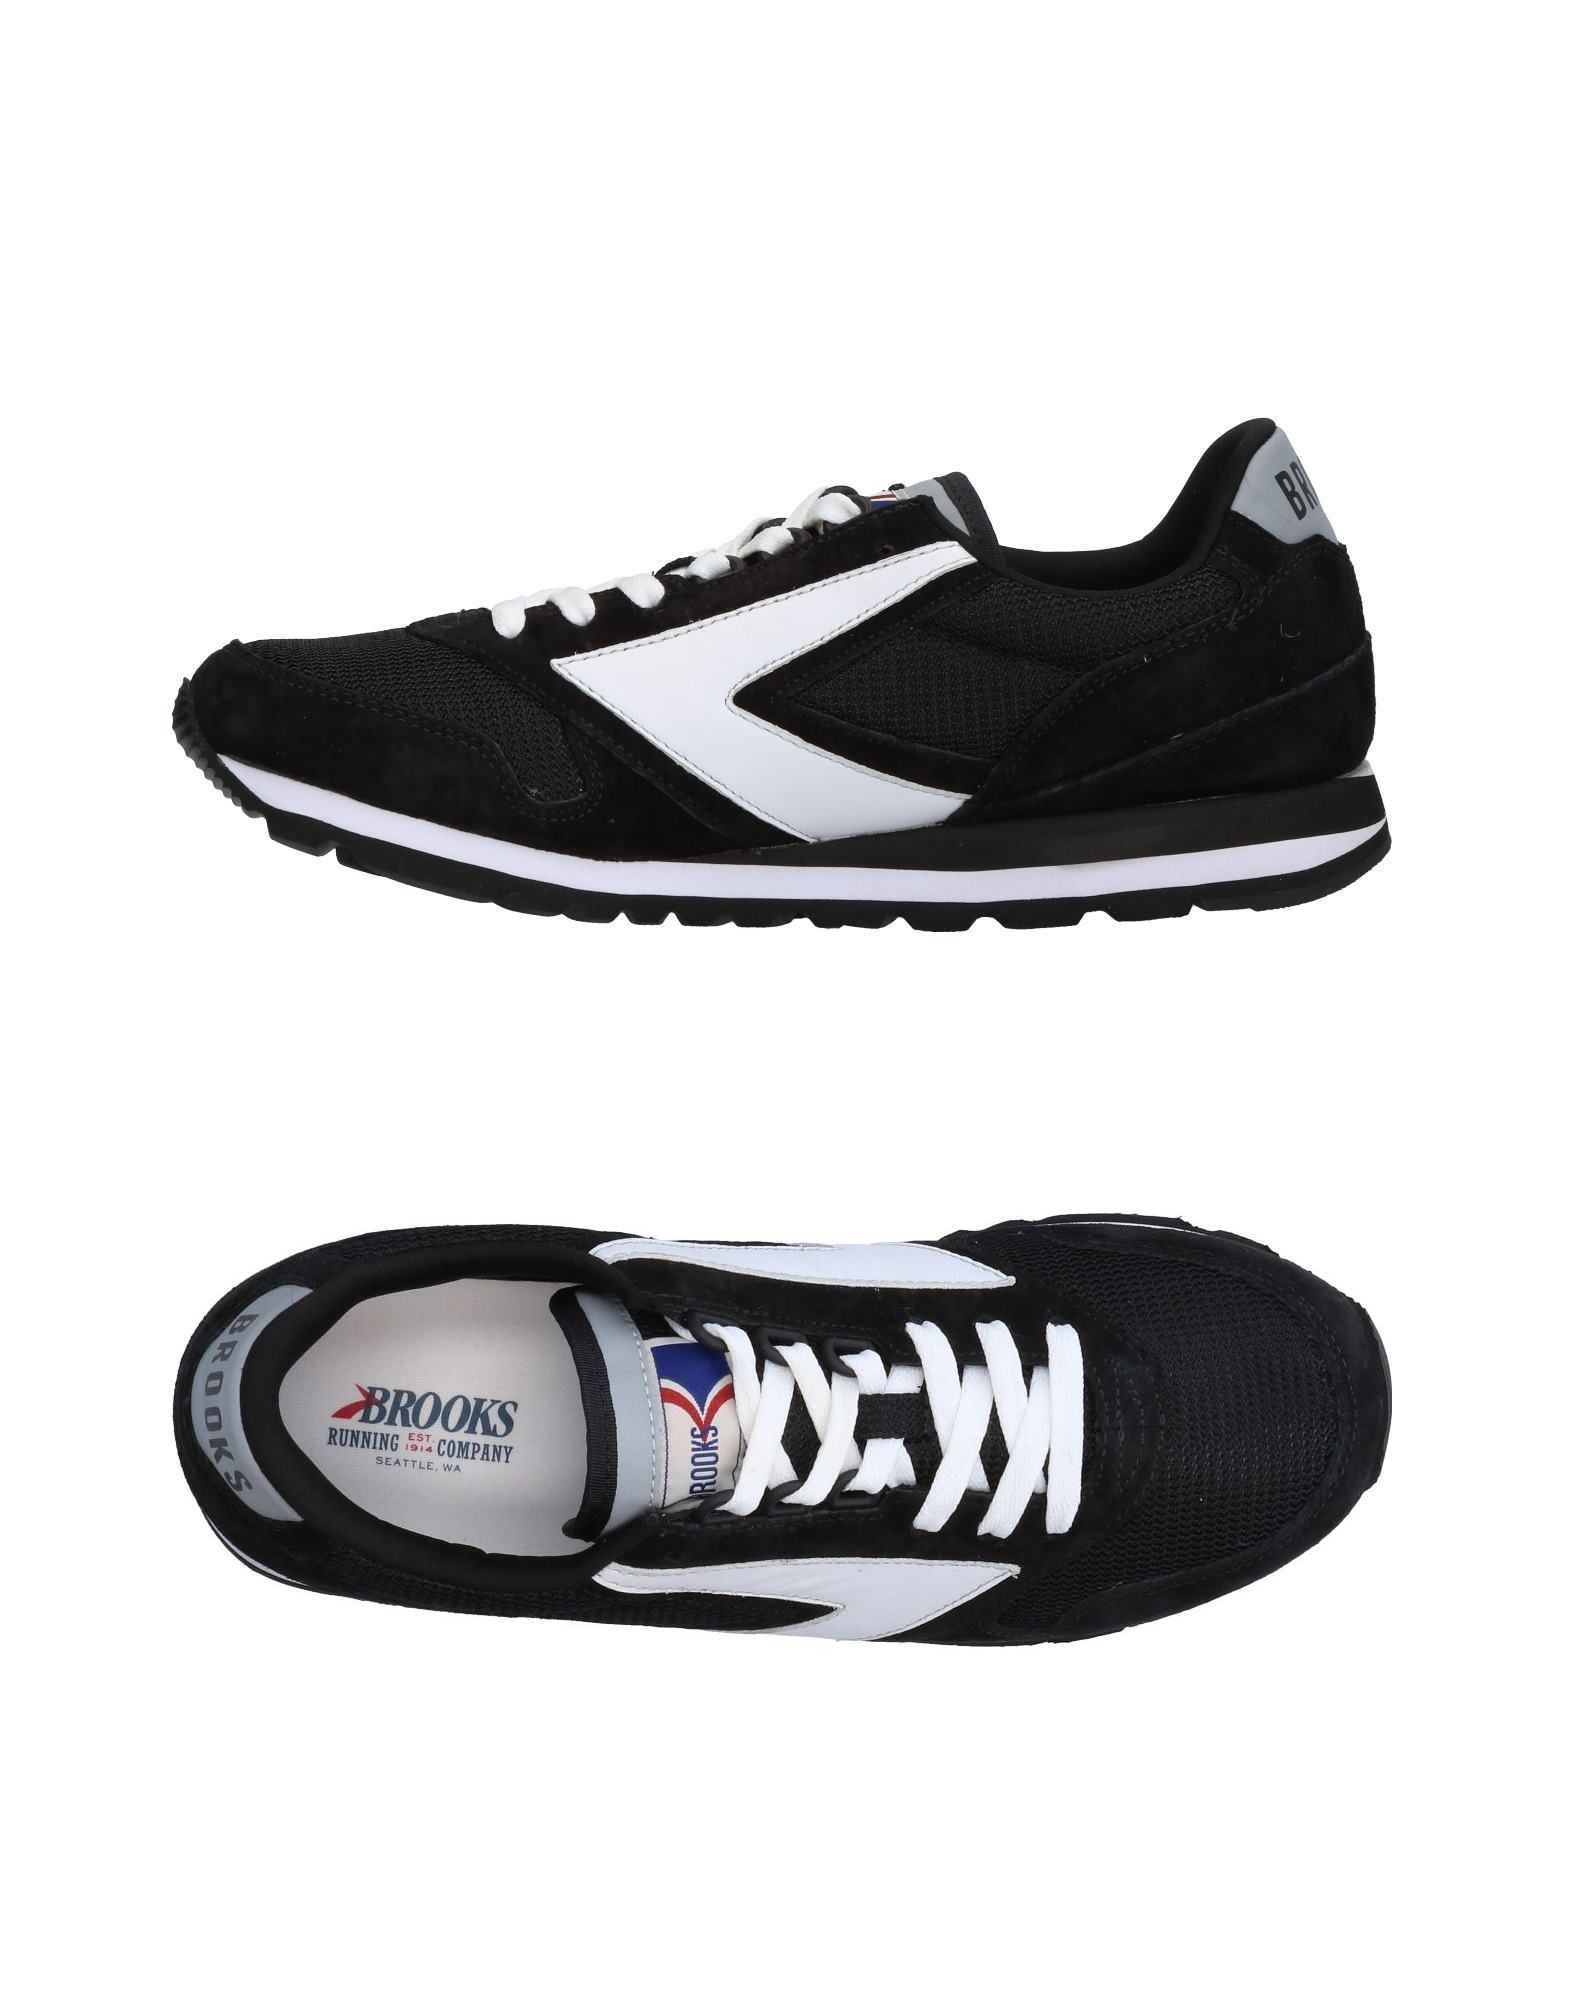 brooks низкие кеды и кроссовки BROOKS Низкие кеды и кроссовки